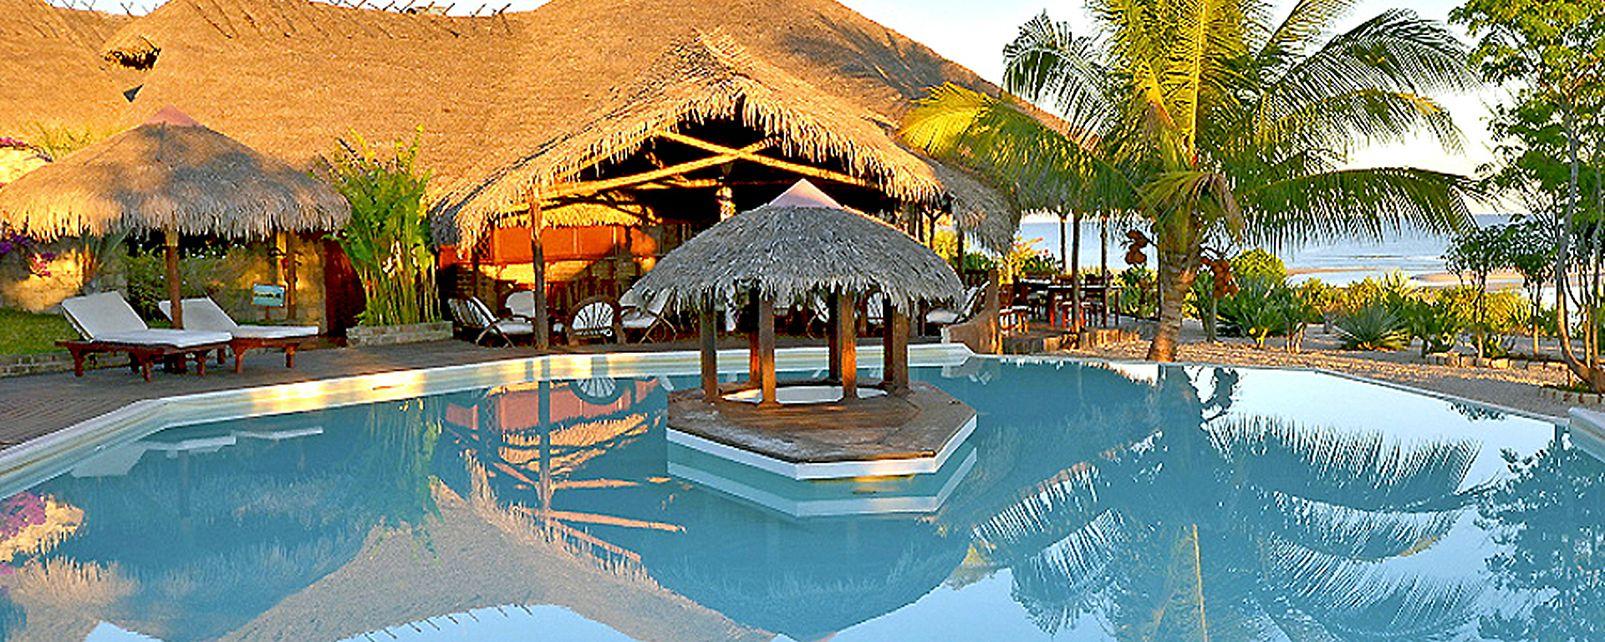 Hotel Antsanitia Resort